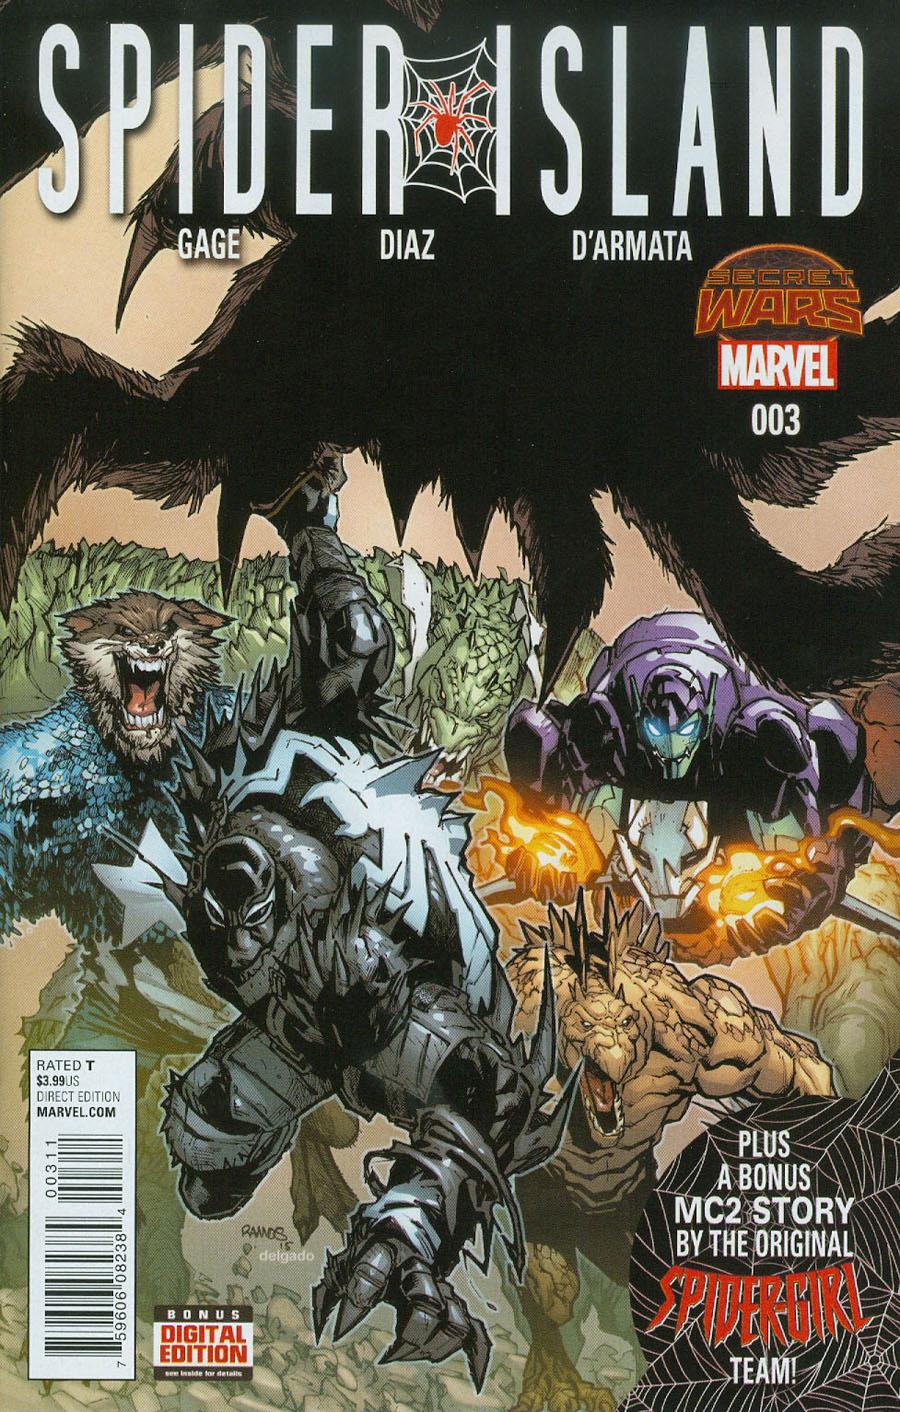 Spider-Island #3 Cover A Regular Humberto Ramos Cover (Secret Wars Warzones Tie-In)